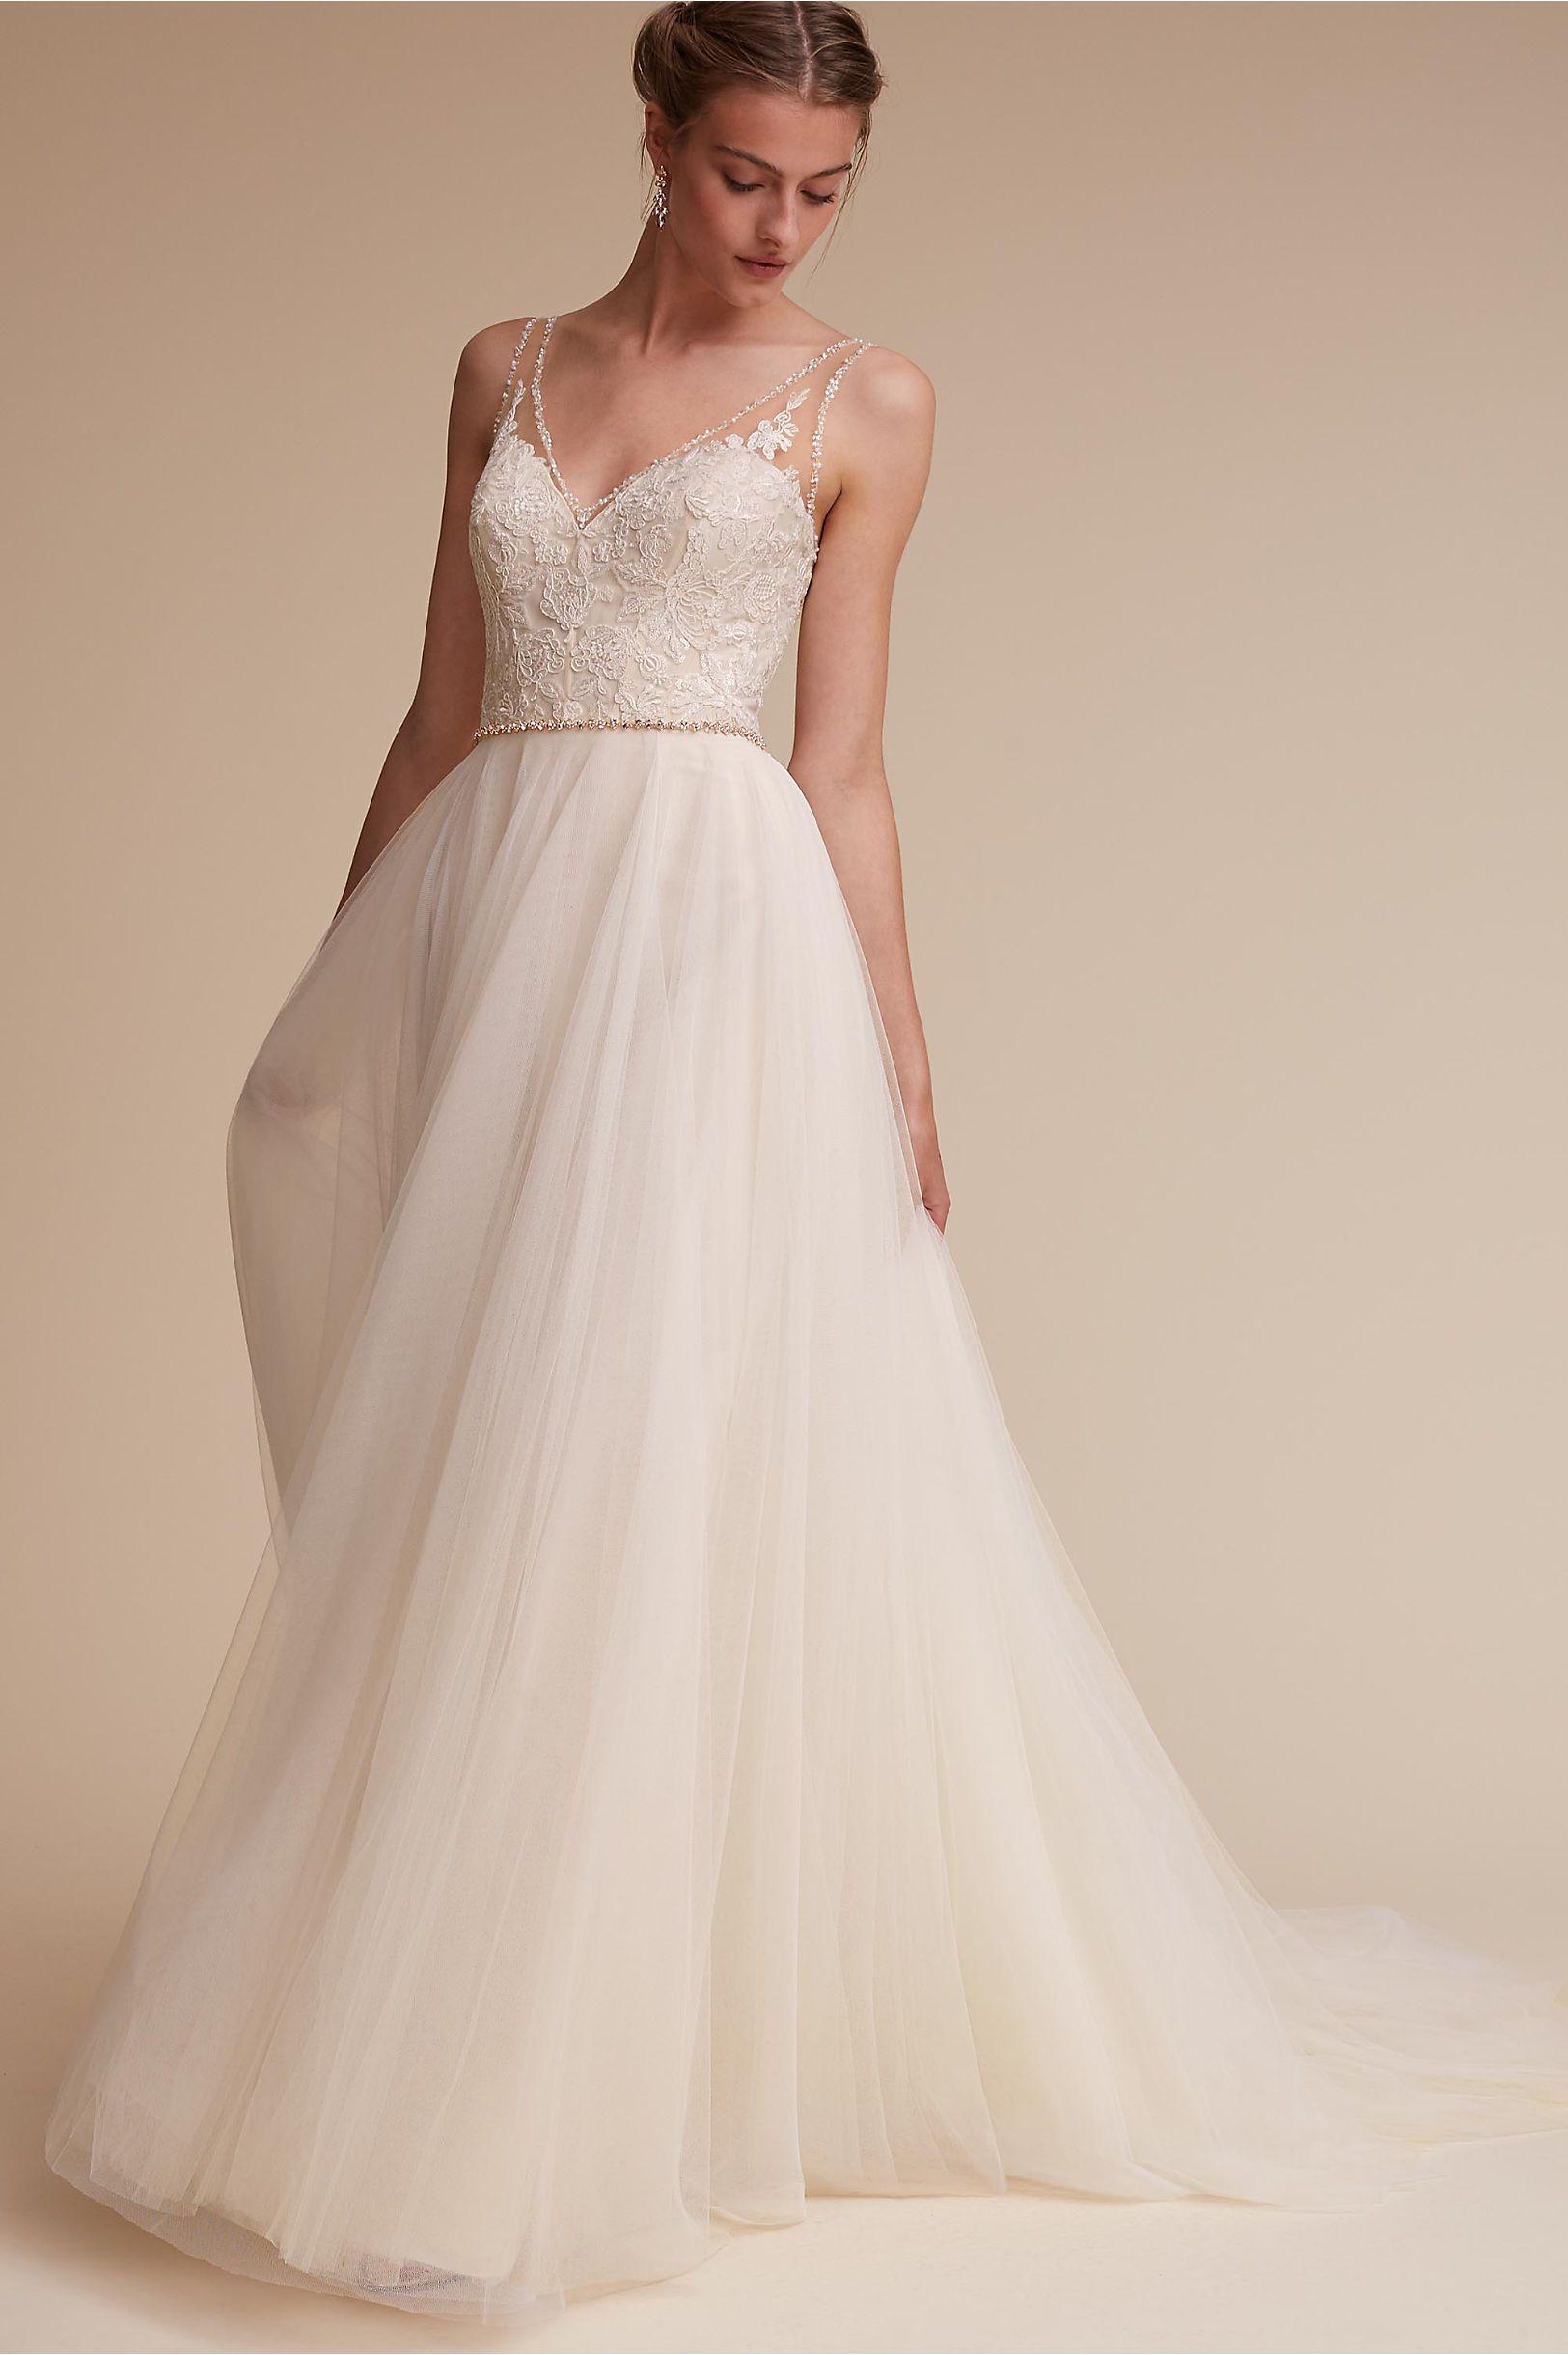 sundress wedding dress BHLDN Cassia Gown in Bride Wedding Dresses BHLDN